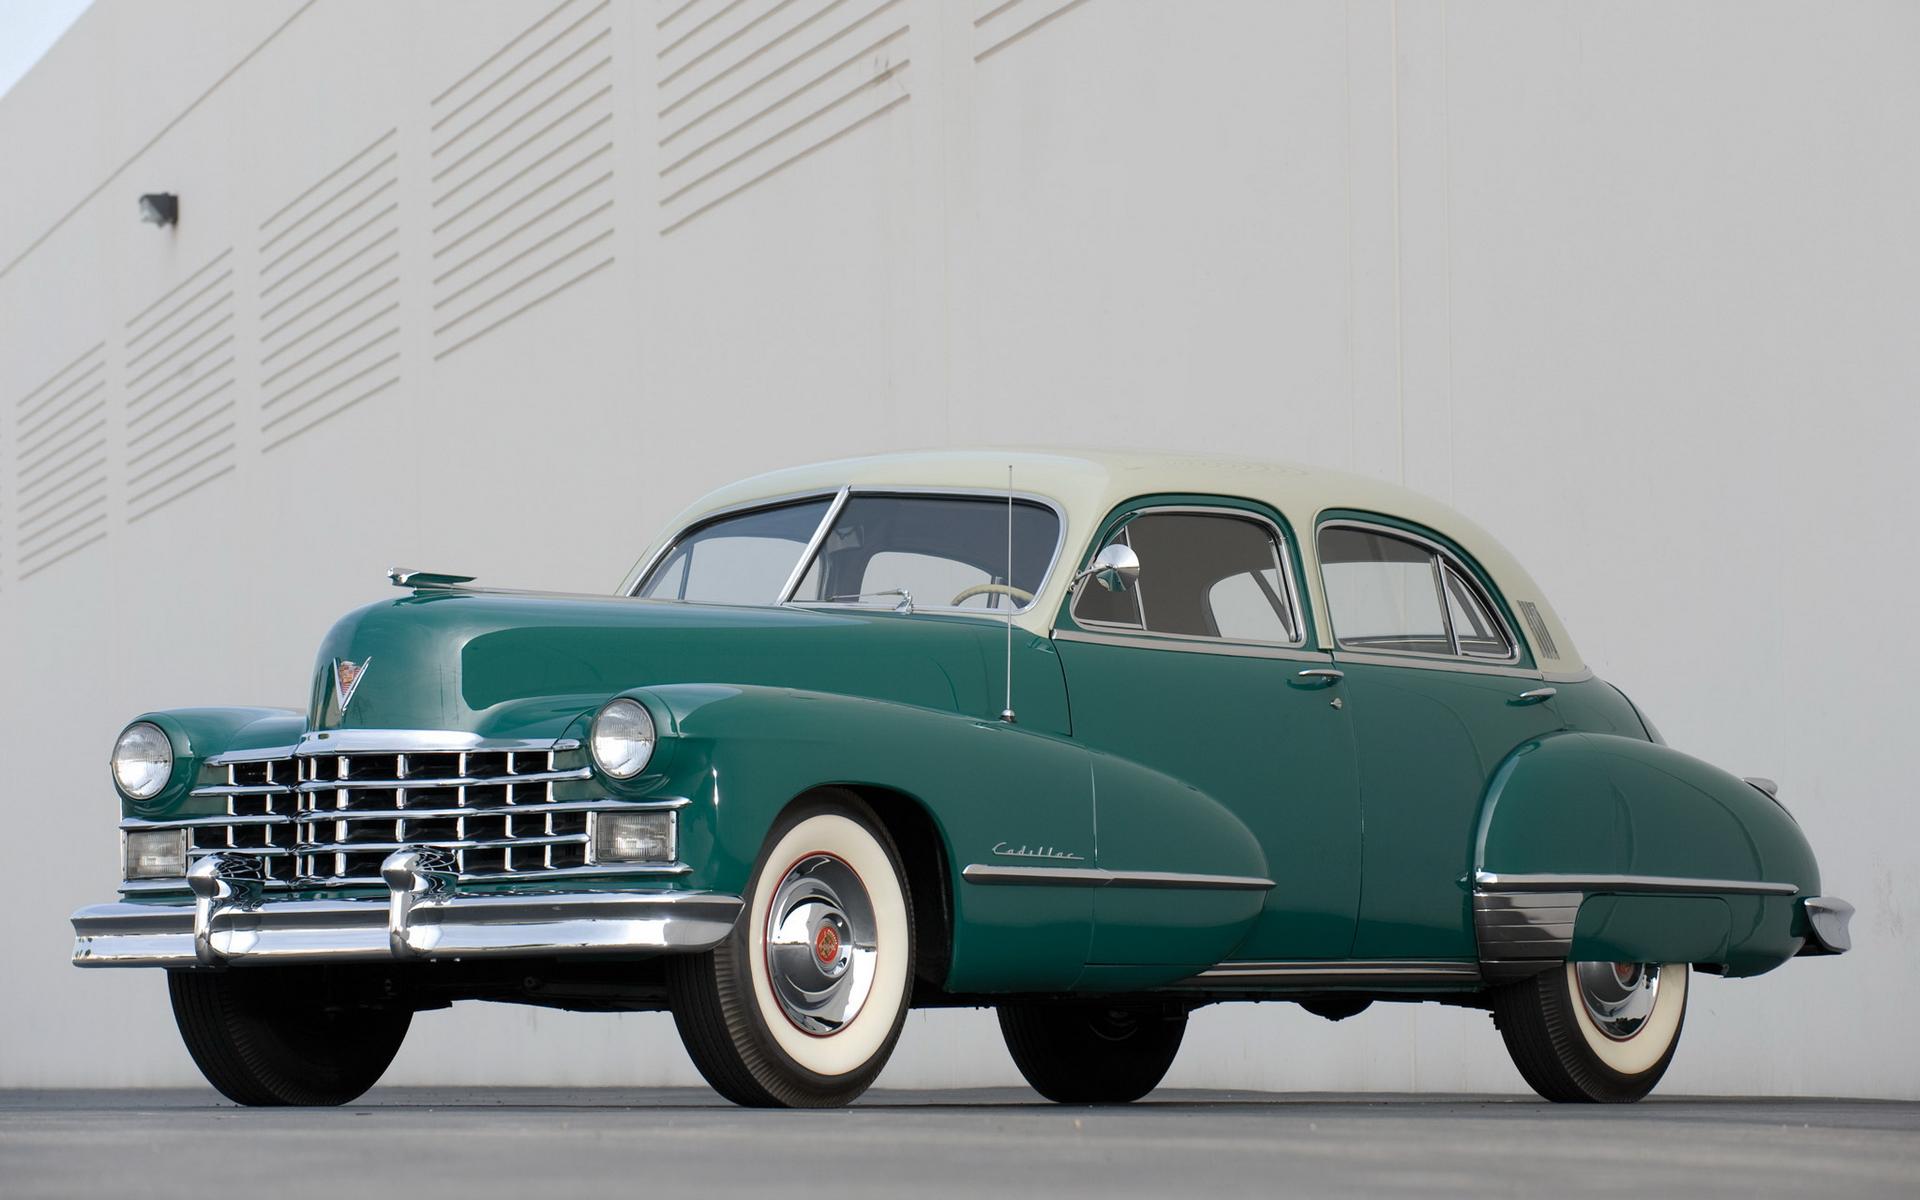 1947 cadillac fleetwod hd wallpaper background image - Cadillac wallpaper ...